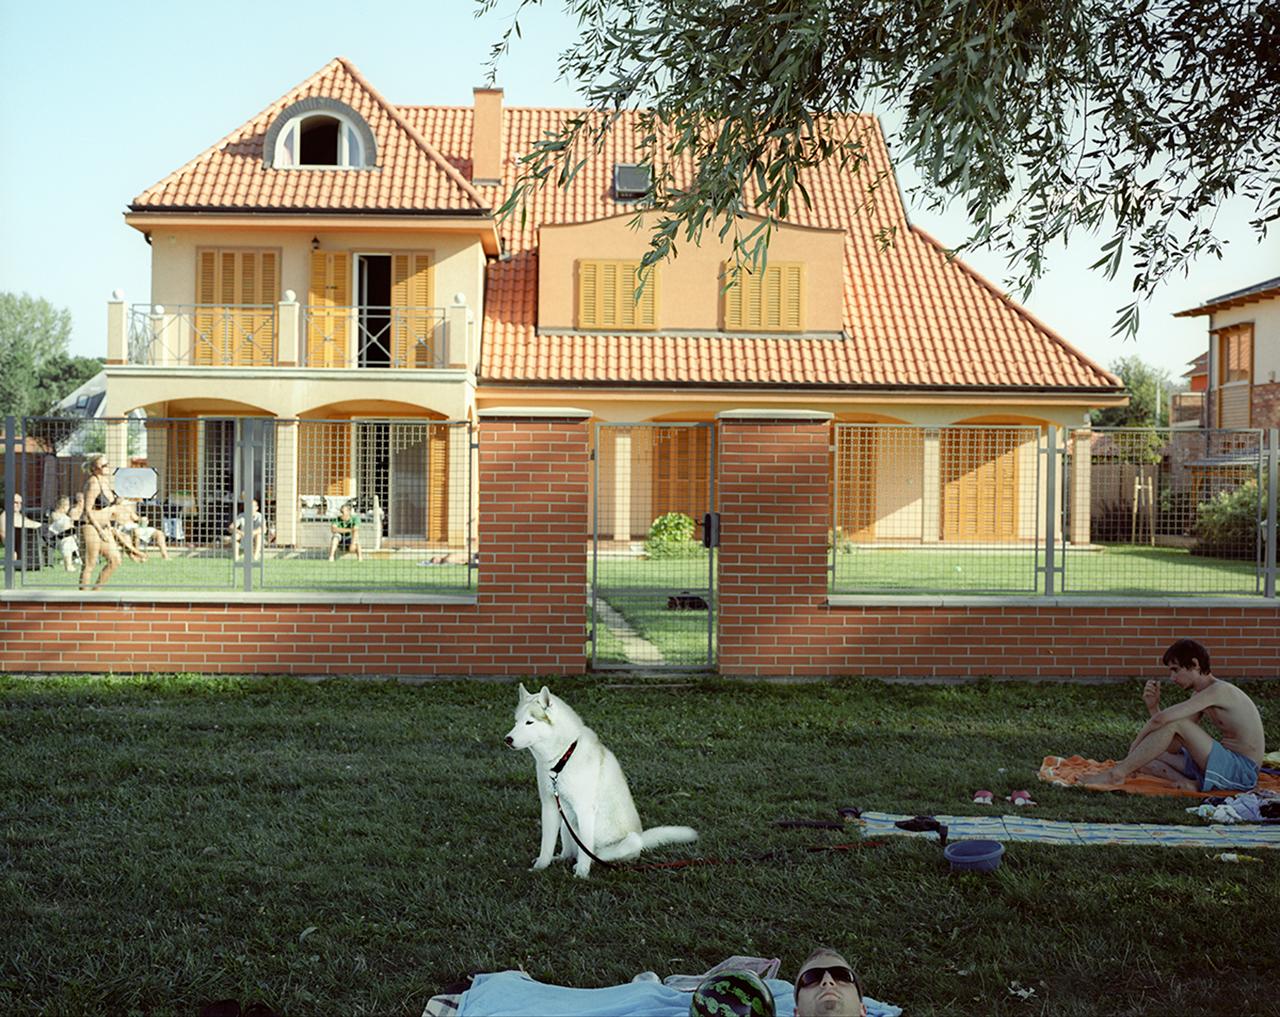 Solarski_M_HungarianSea_3